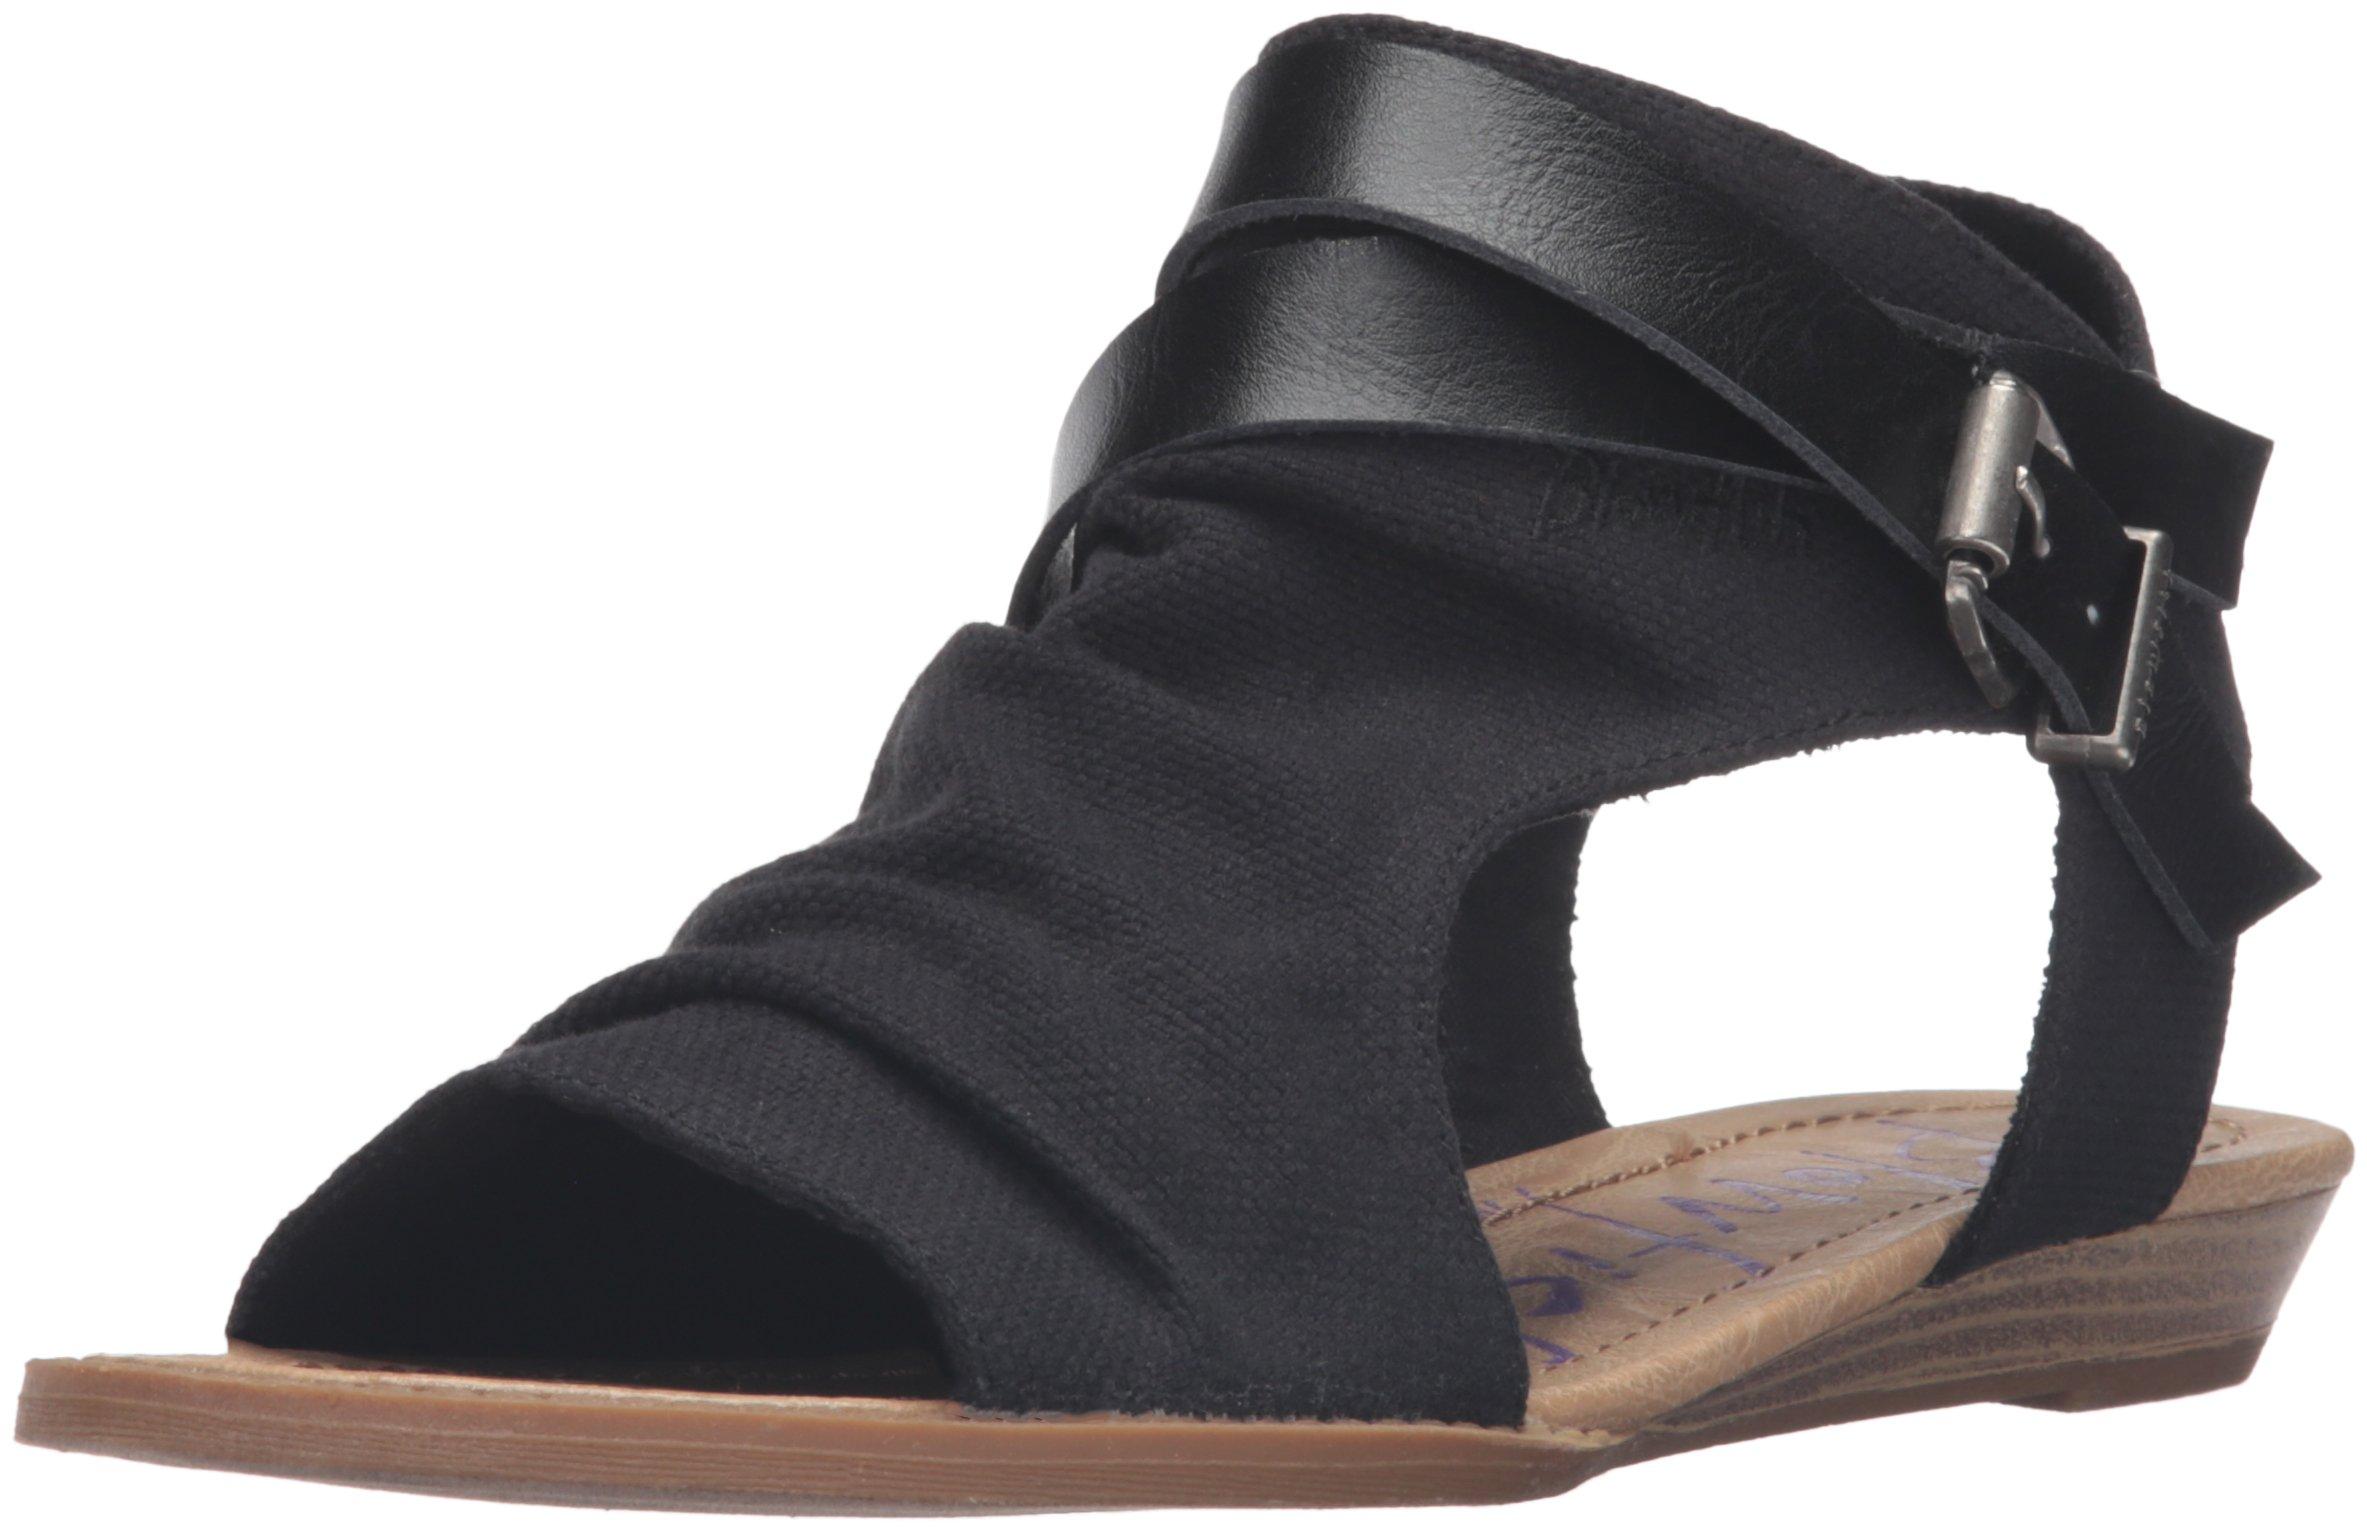 Blowfish Women's Balla Wedge Sandal, Black, 7 Medium US